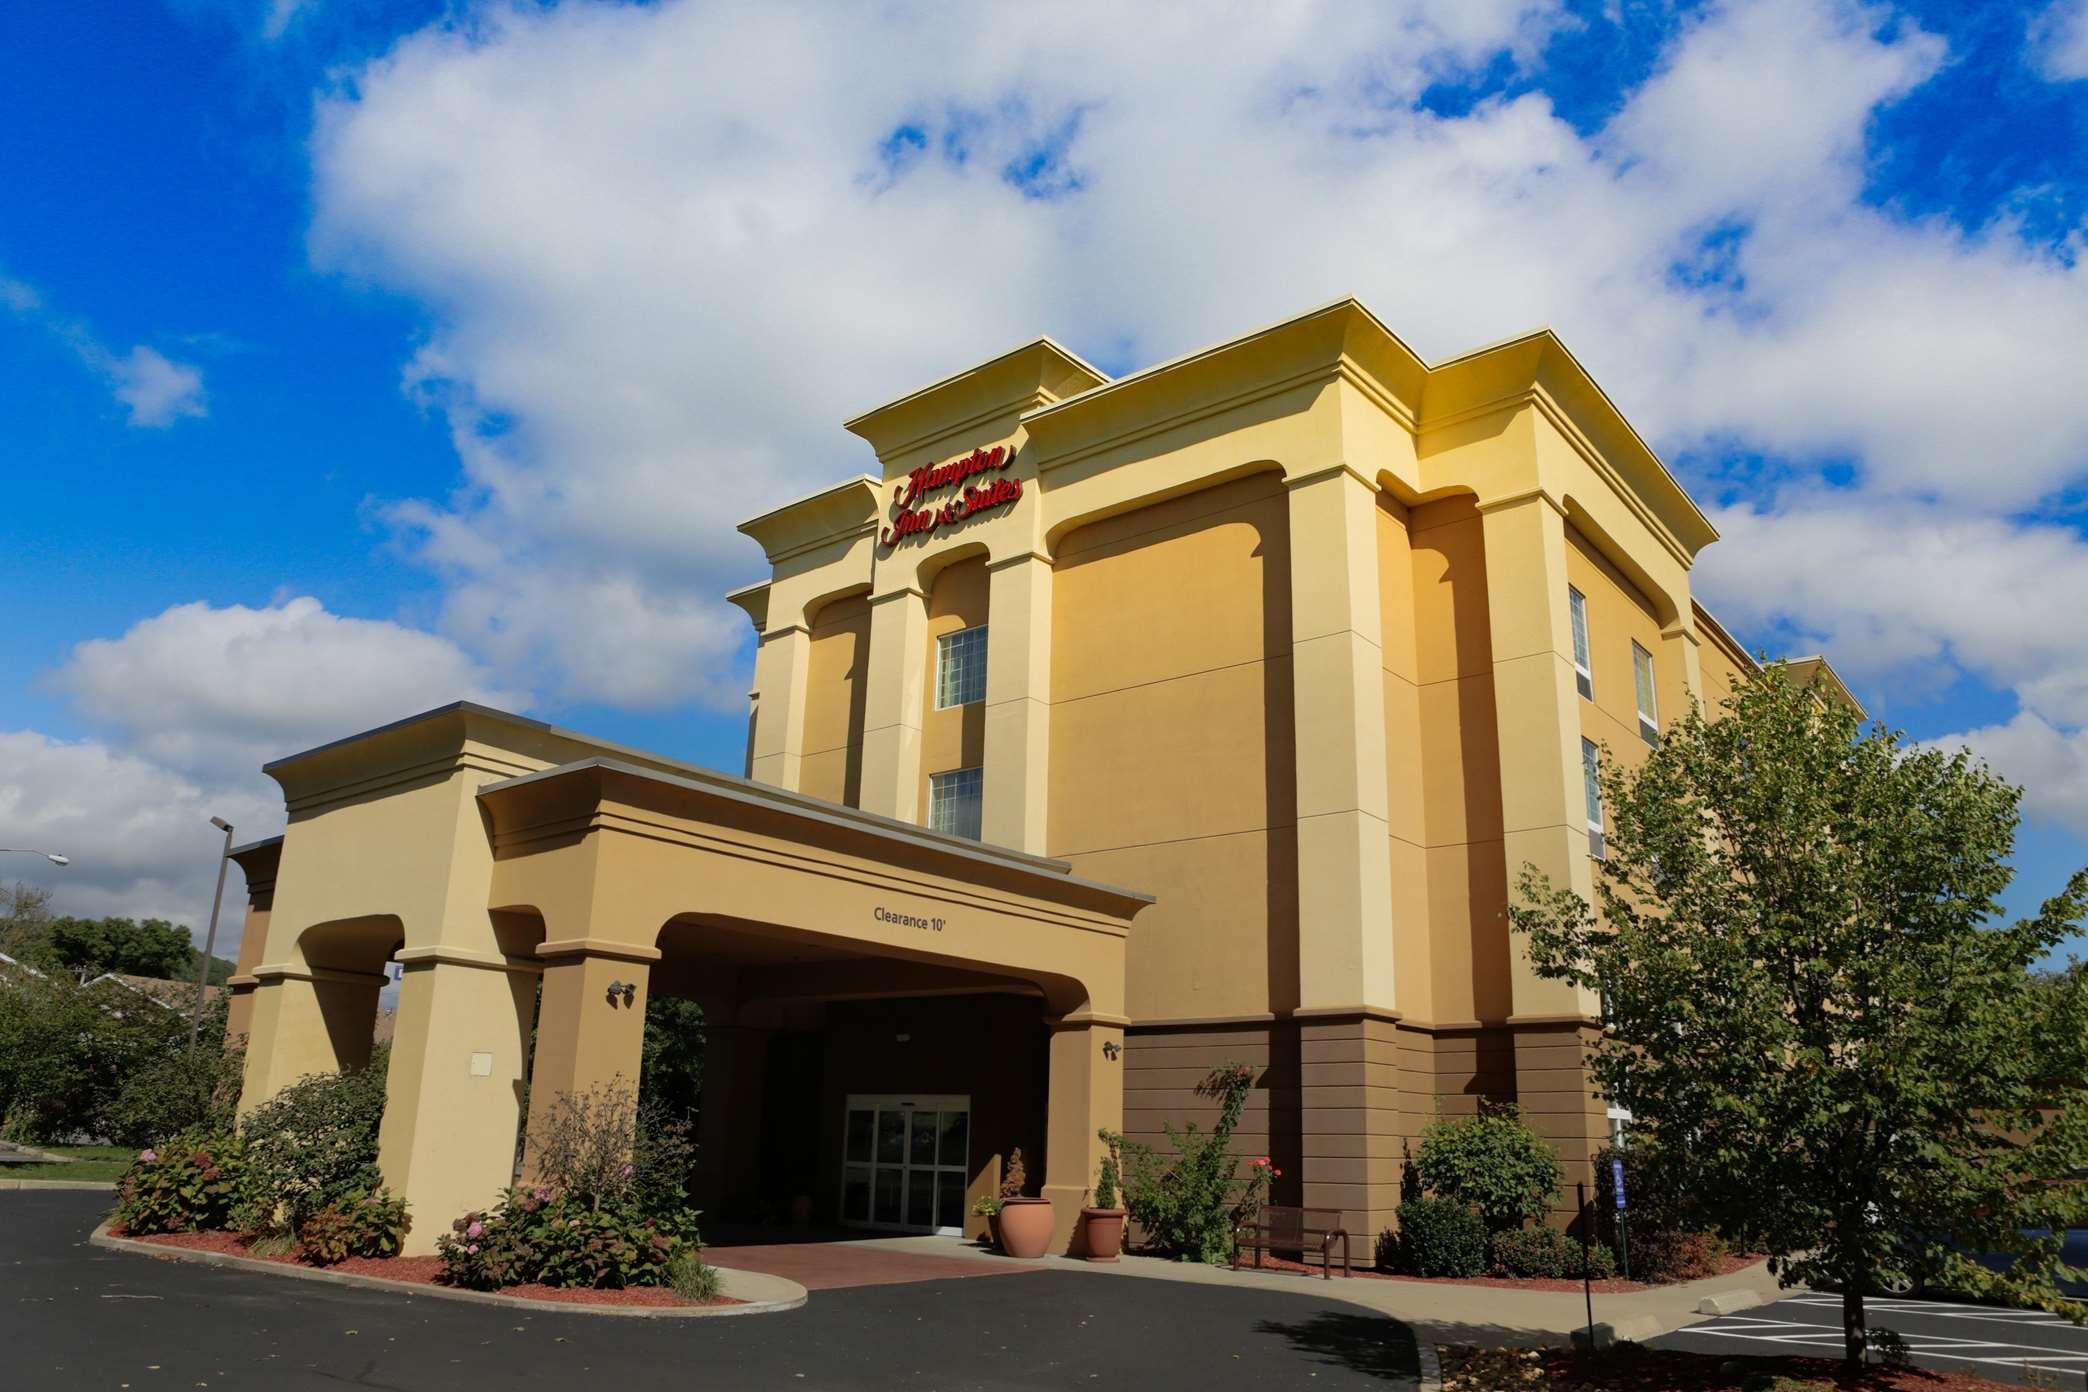 Hampton Inn & Suites Greenfield image 0